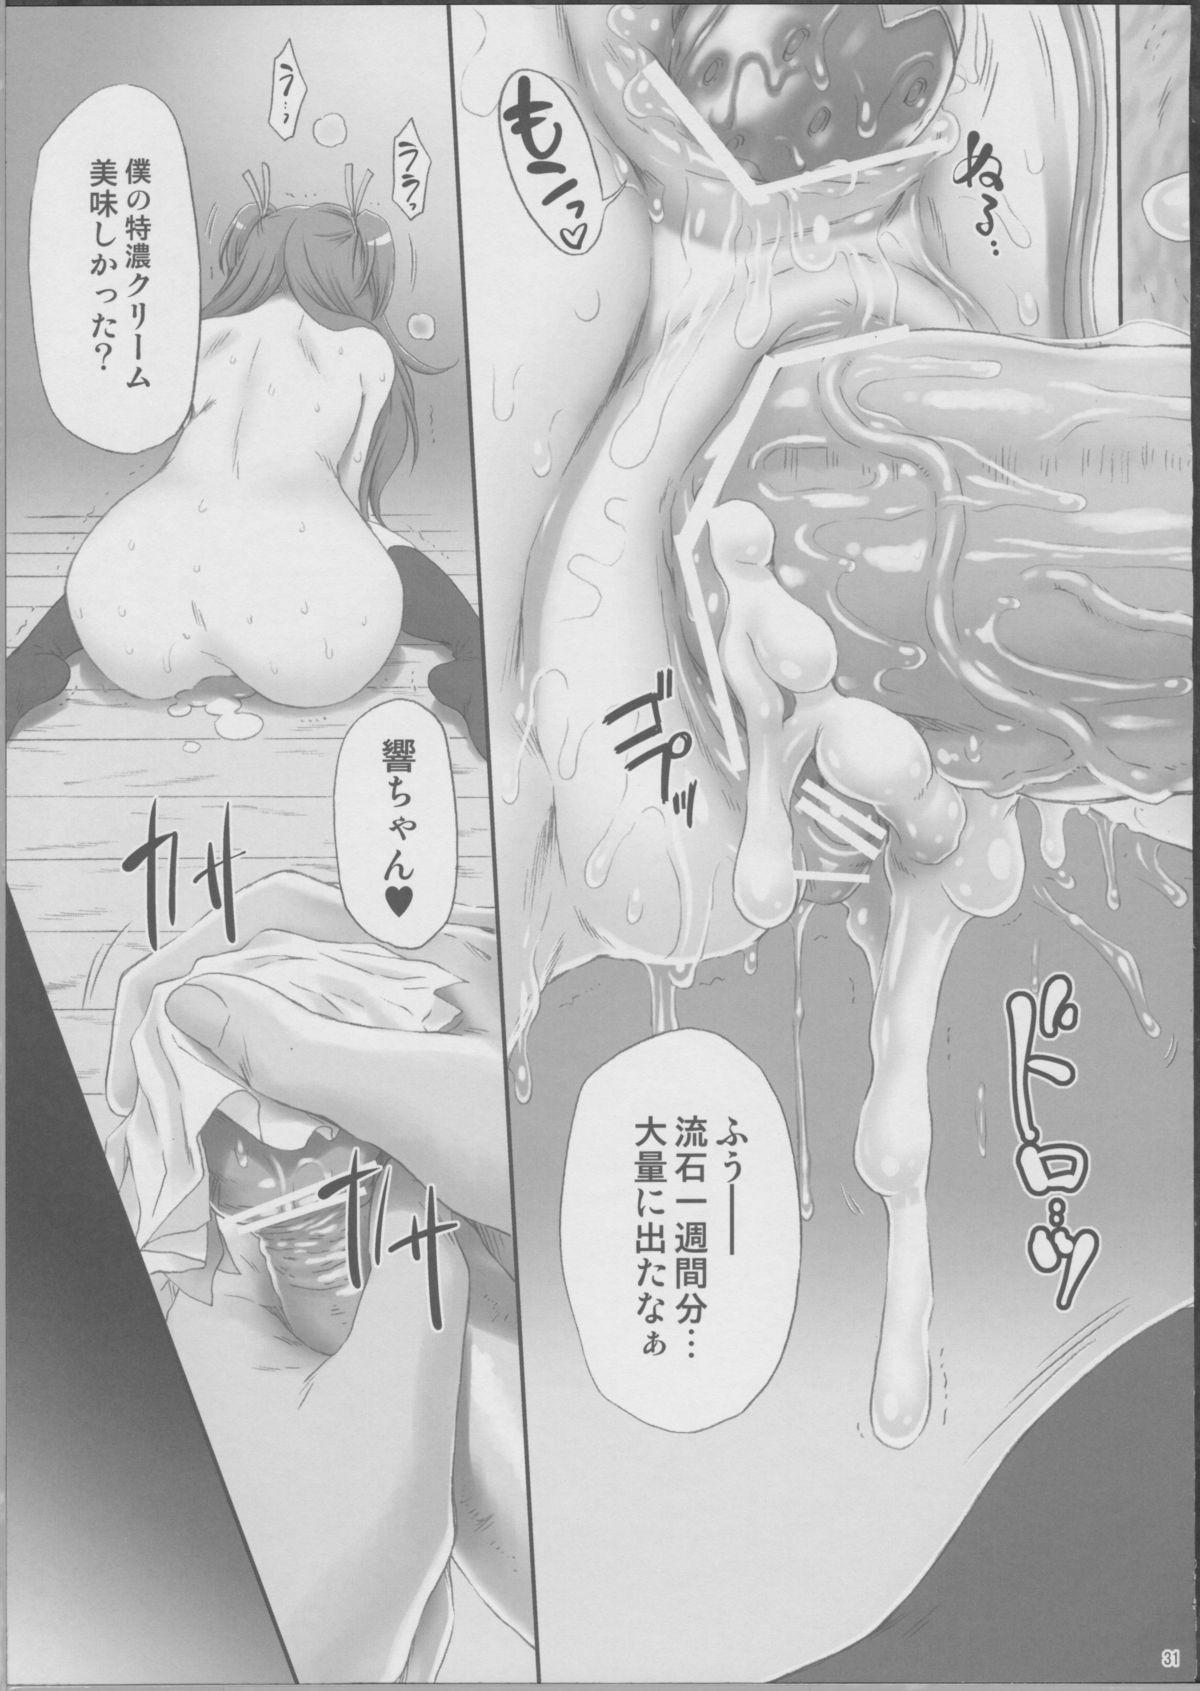 Hibiki de asobou ♪ 29